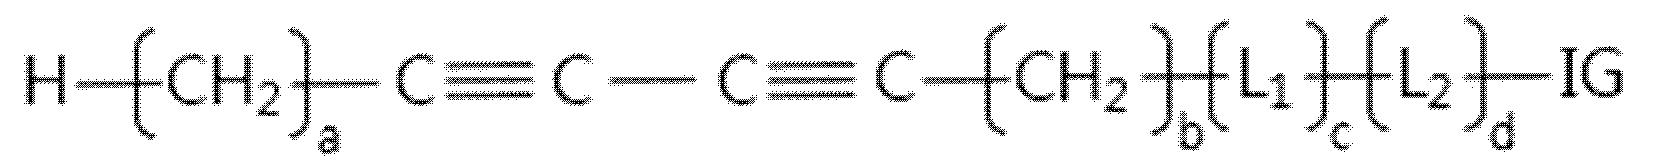 Figure PCTKR2016011399-appb-I000021